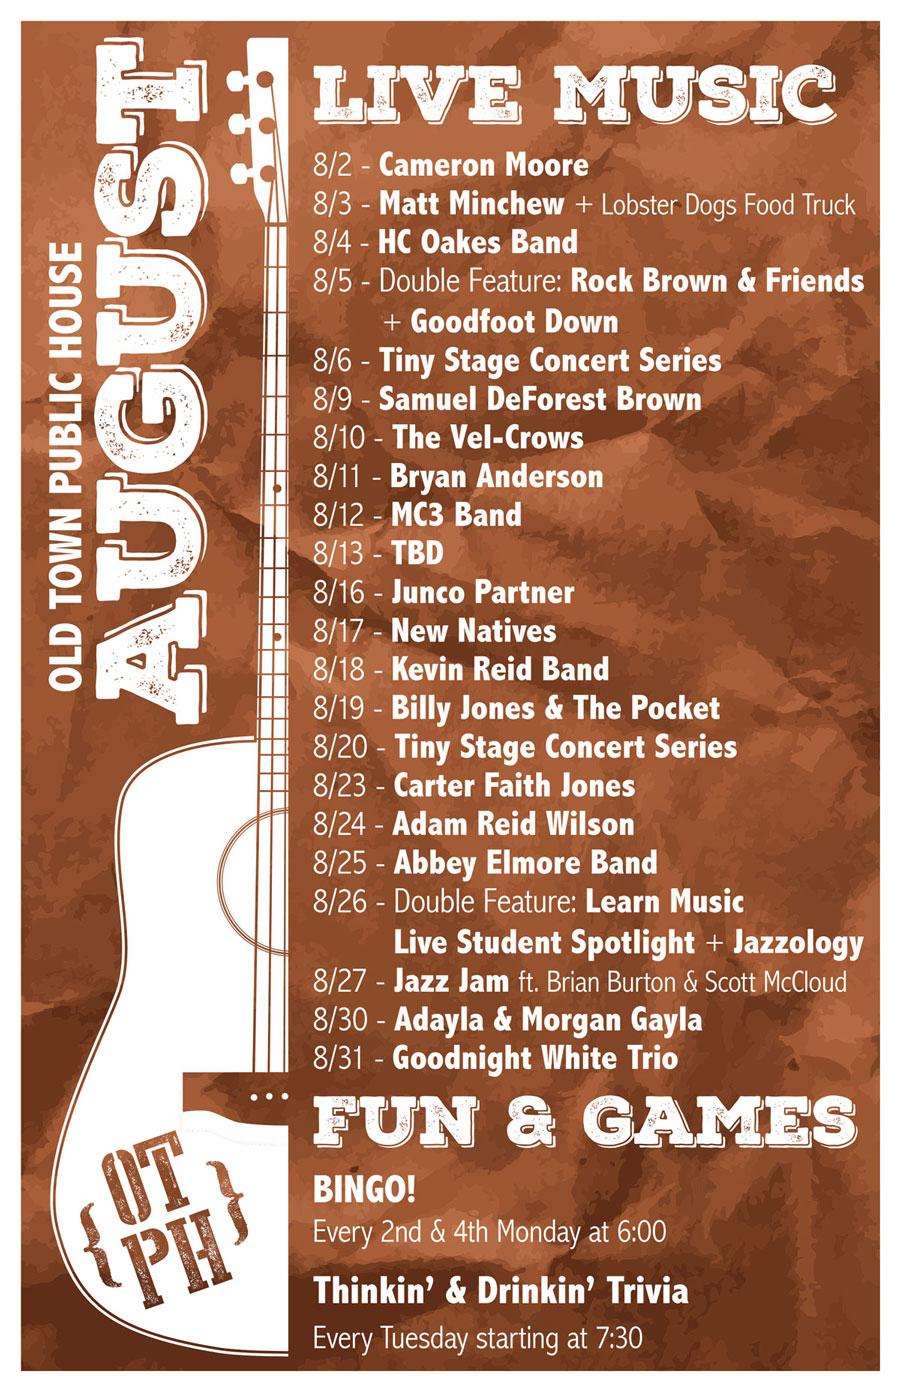 Old Town Public House August Event Calendar